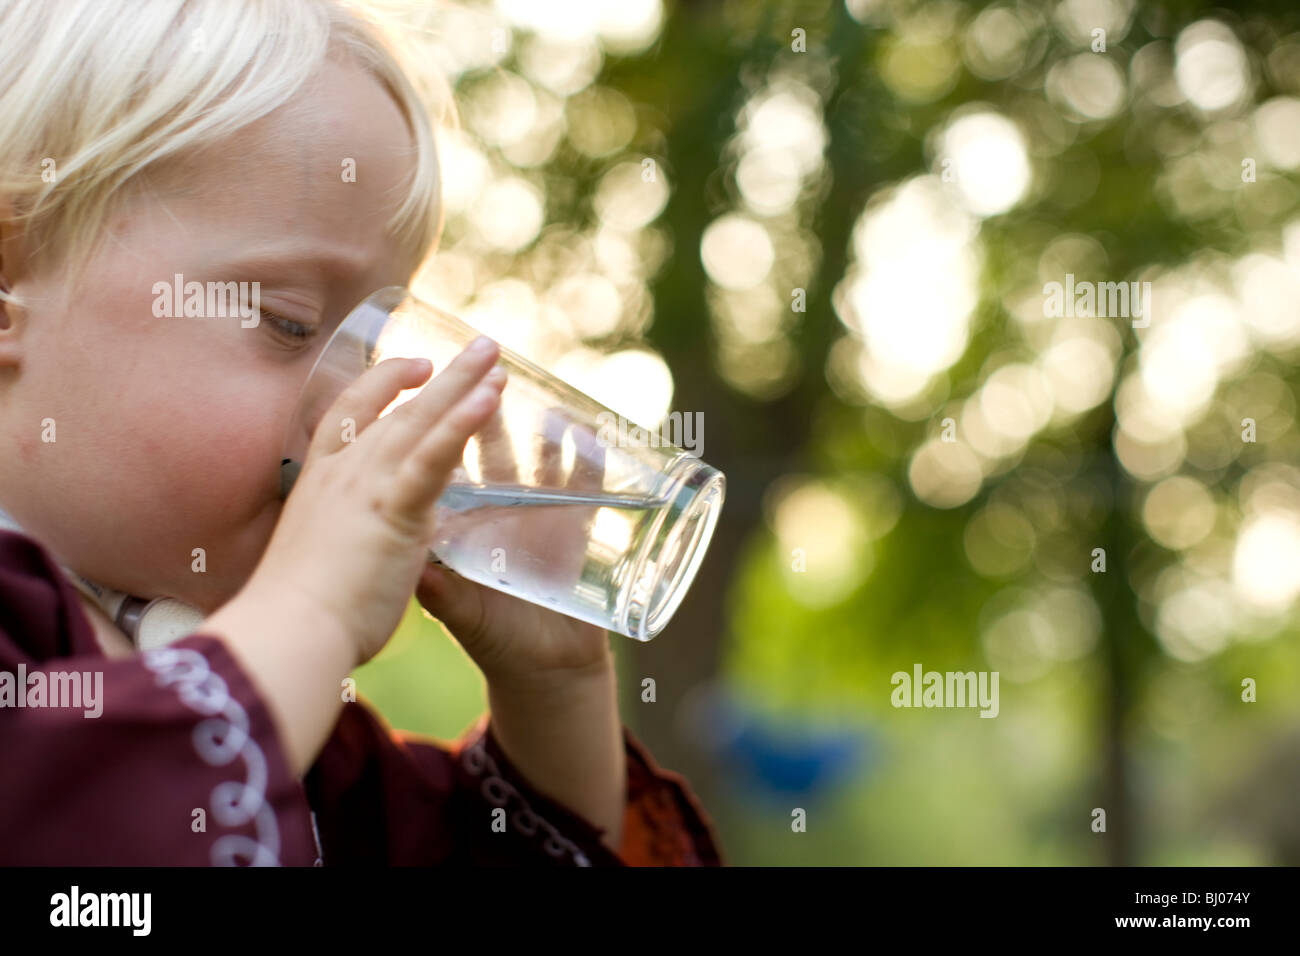 Joven beber un vaso de agua. Imagen De Stock